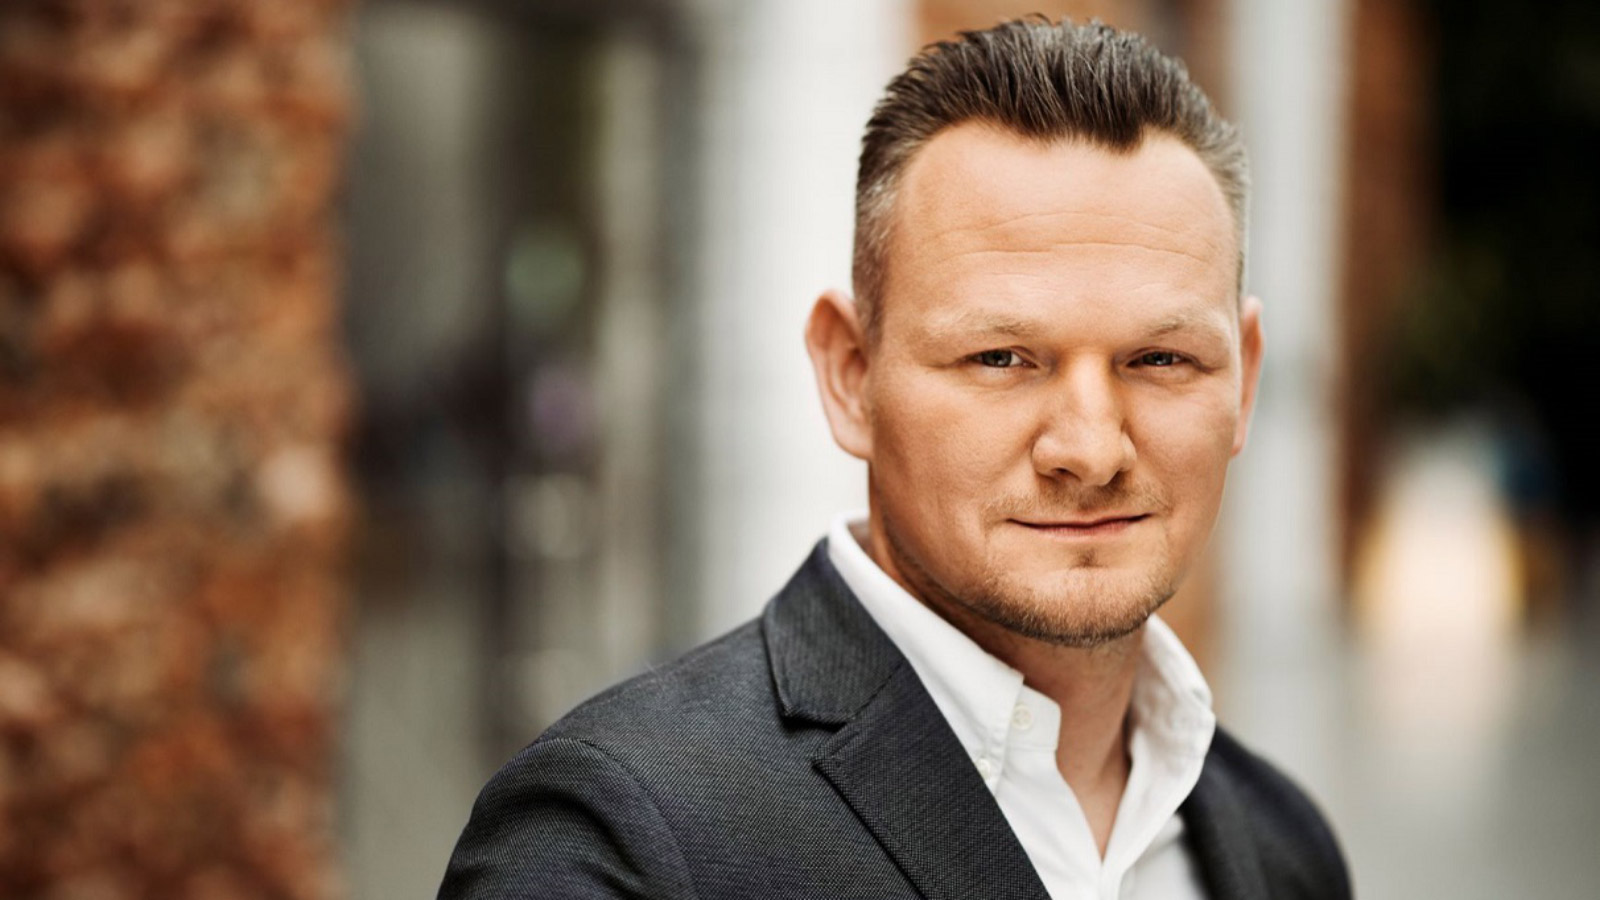 GOOGLE z nowym Dyrektorem awans mediarun Michal Kramarz google for startup 2019